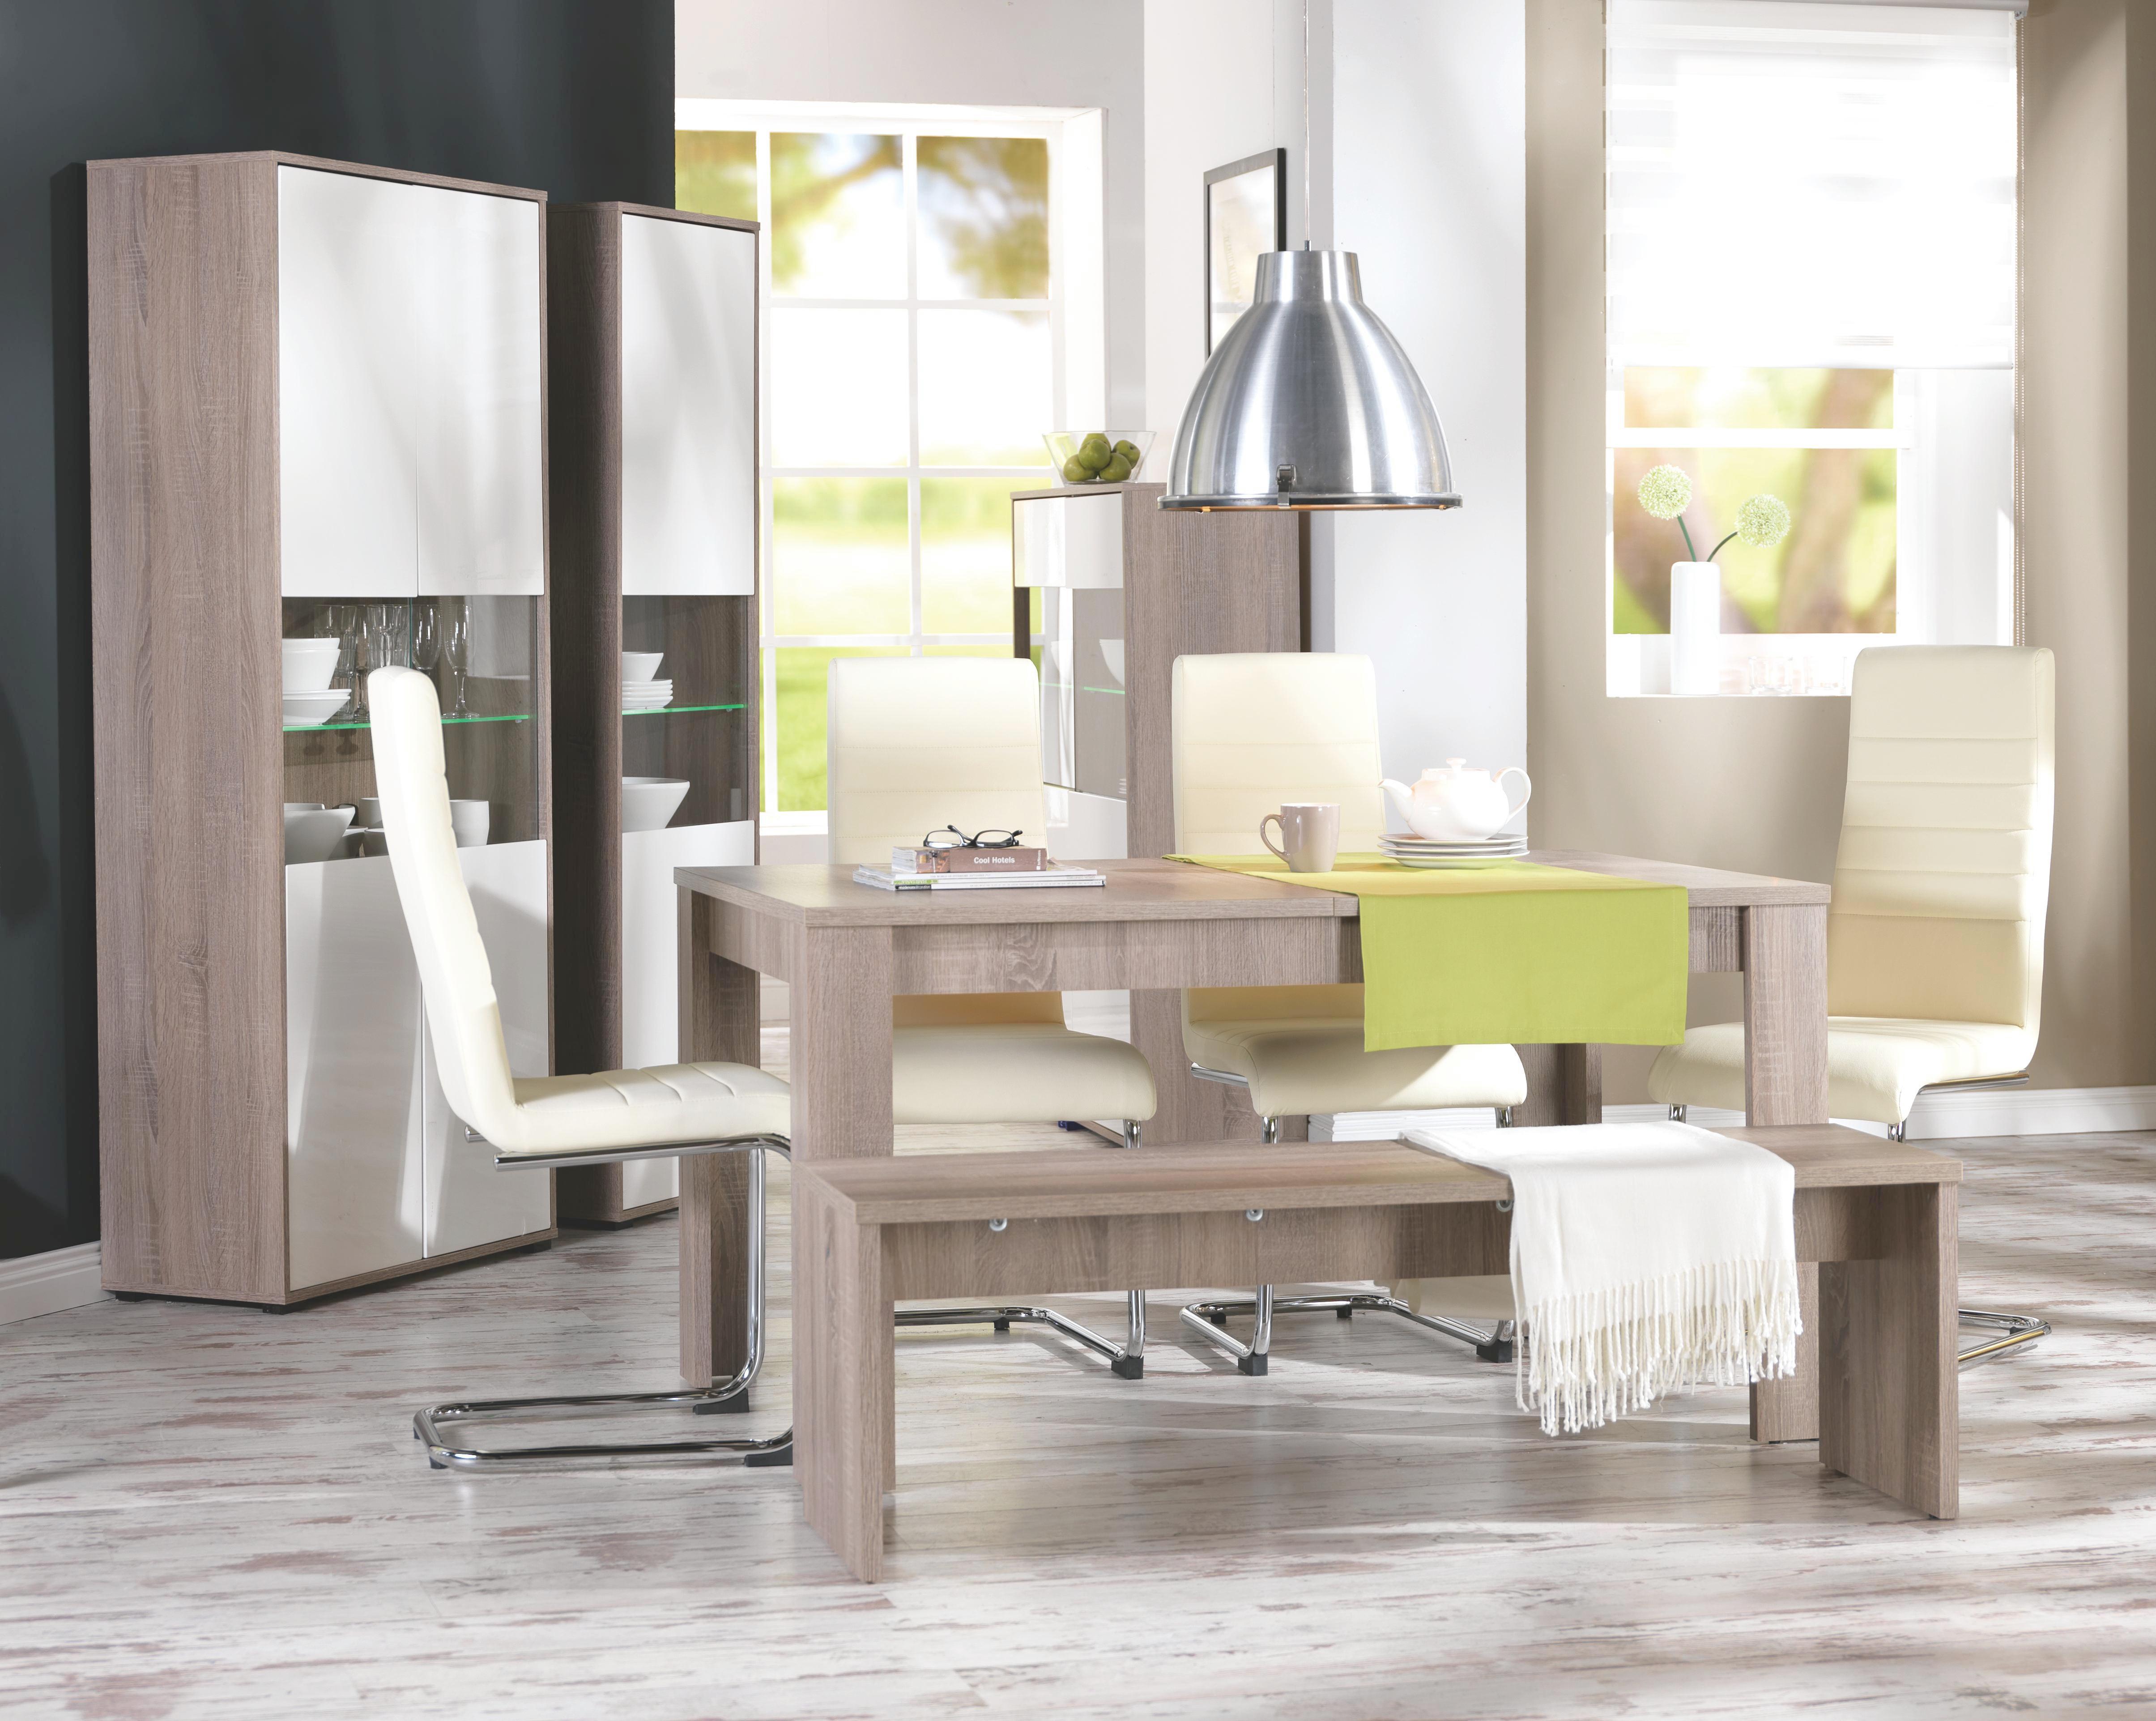 Klop Pasta - barva hrasta tartuf, Moderno, leseni material (138/45/37cm) - MÖMAX modern living